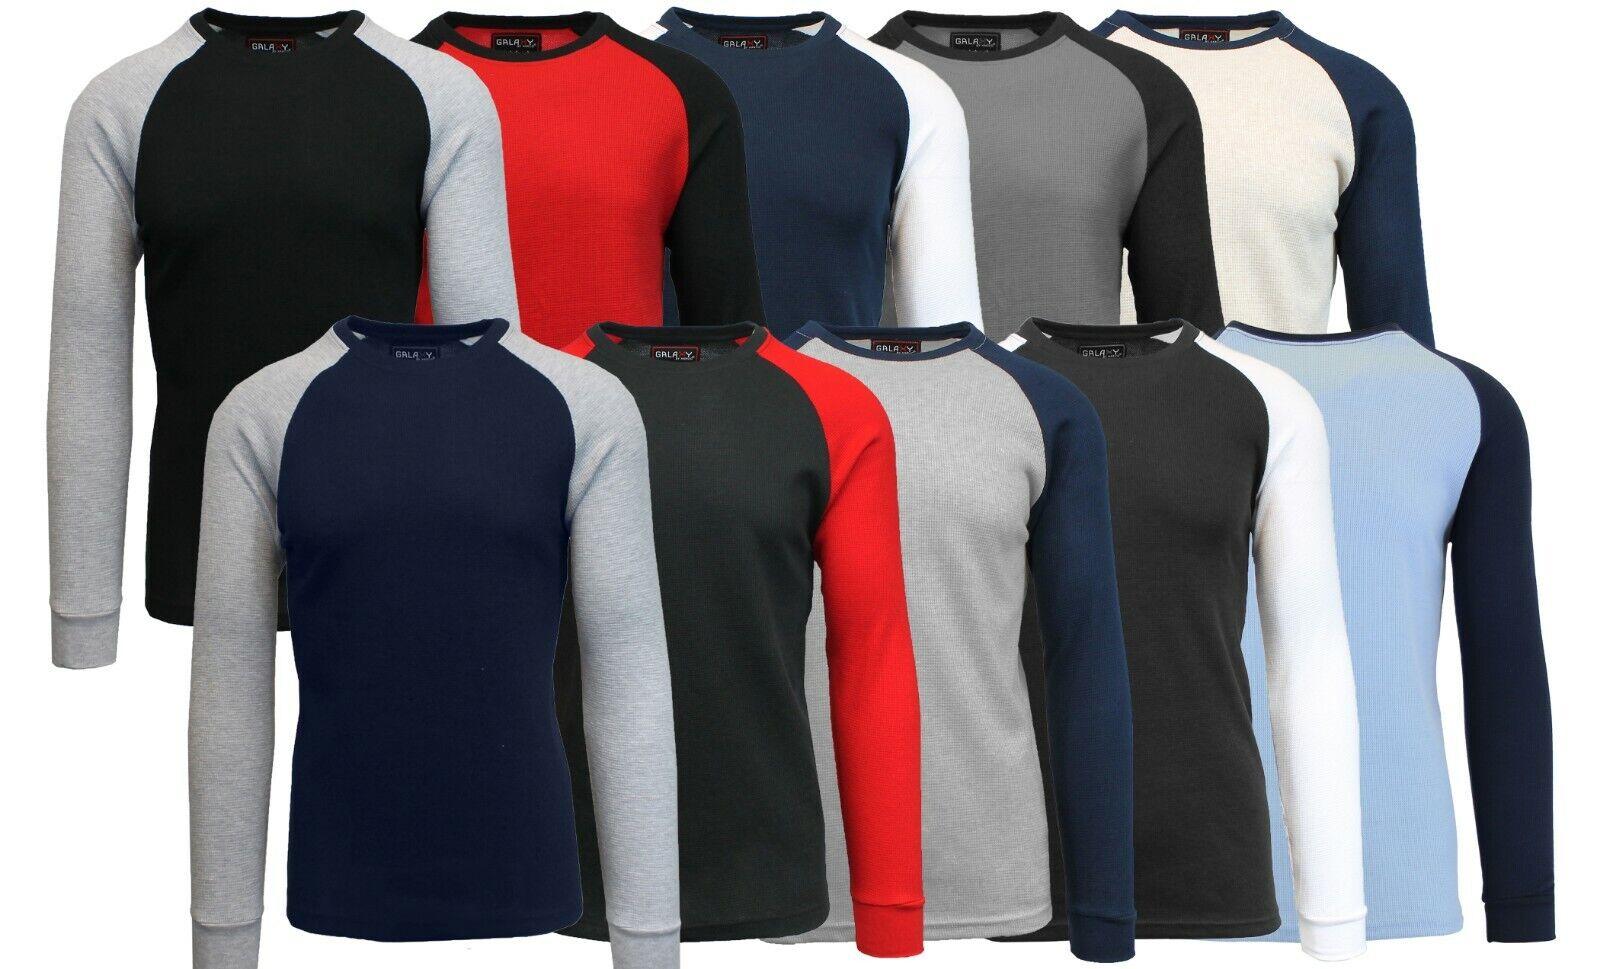 Mens Long Sleeve Thermal Shirt Raglan Tee Crew Neck S M L XL